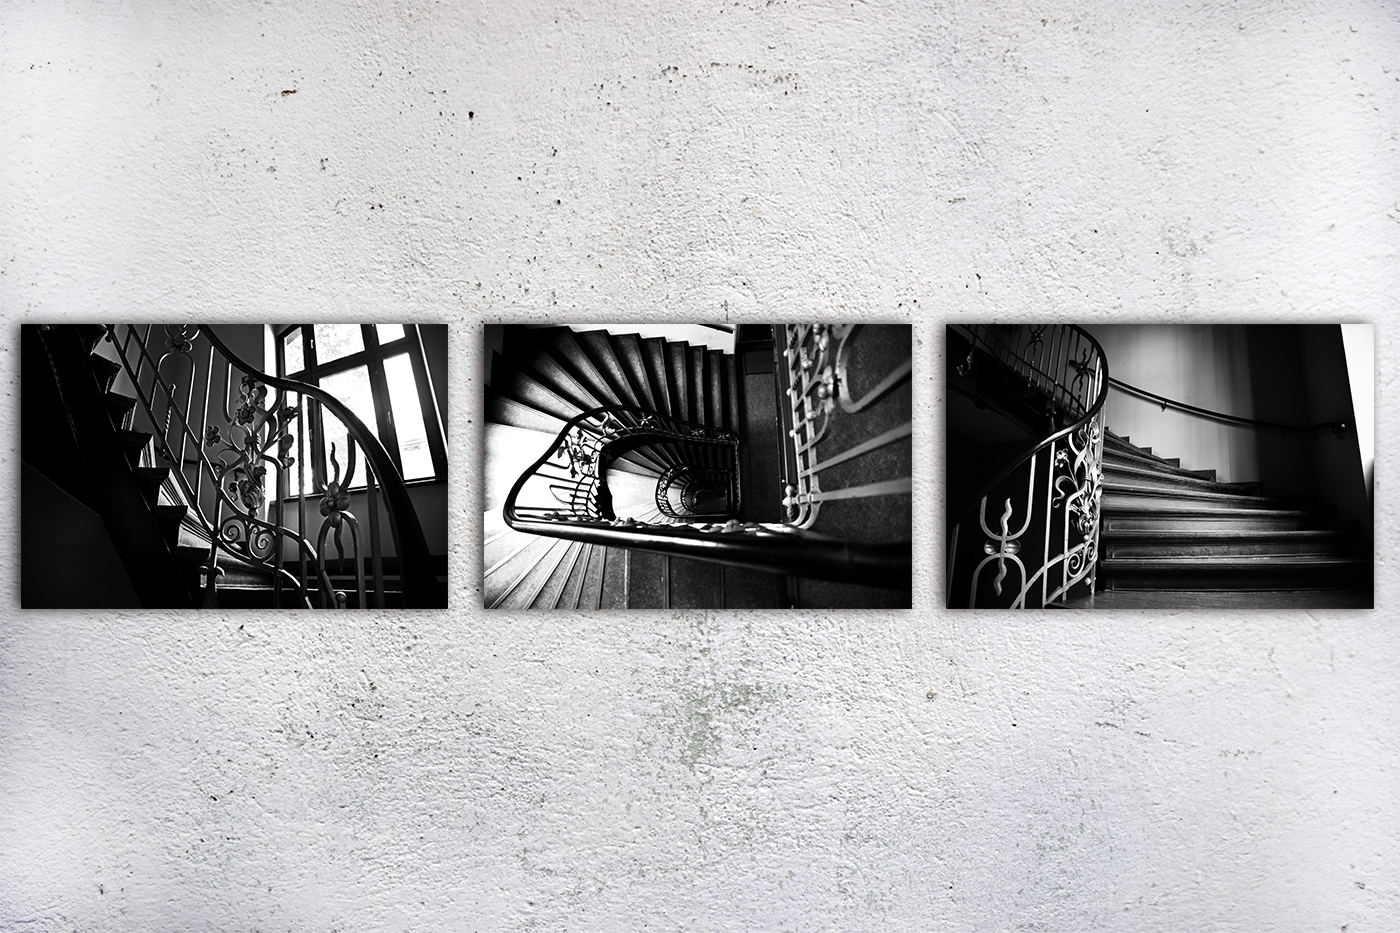 Stairs photo, architecture photo, photo set example image 5